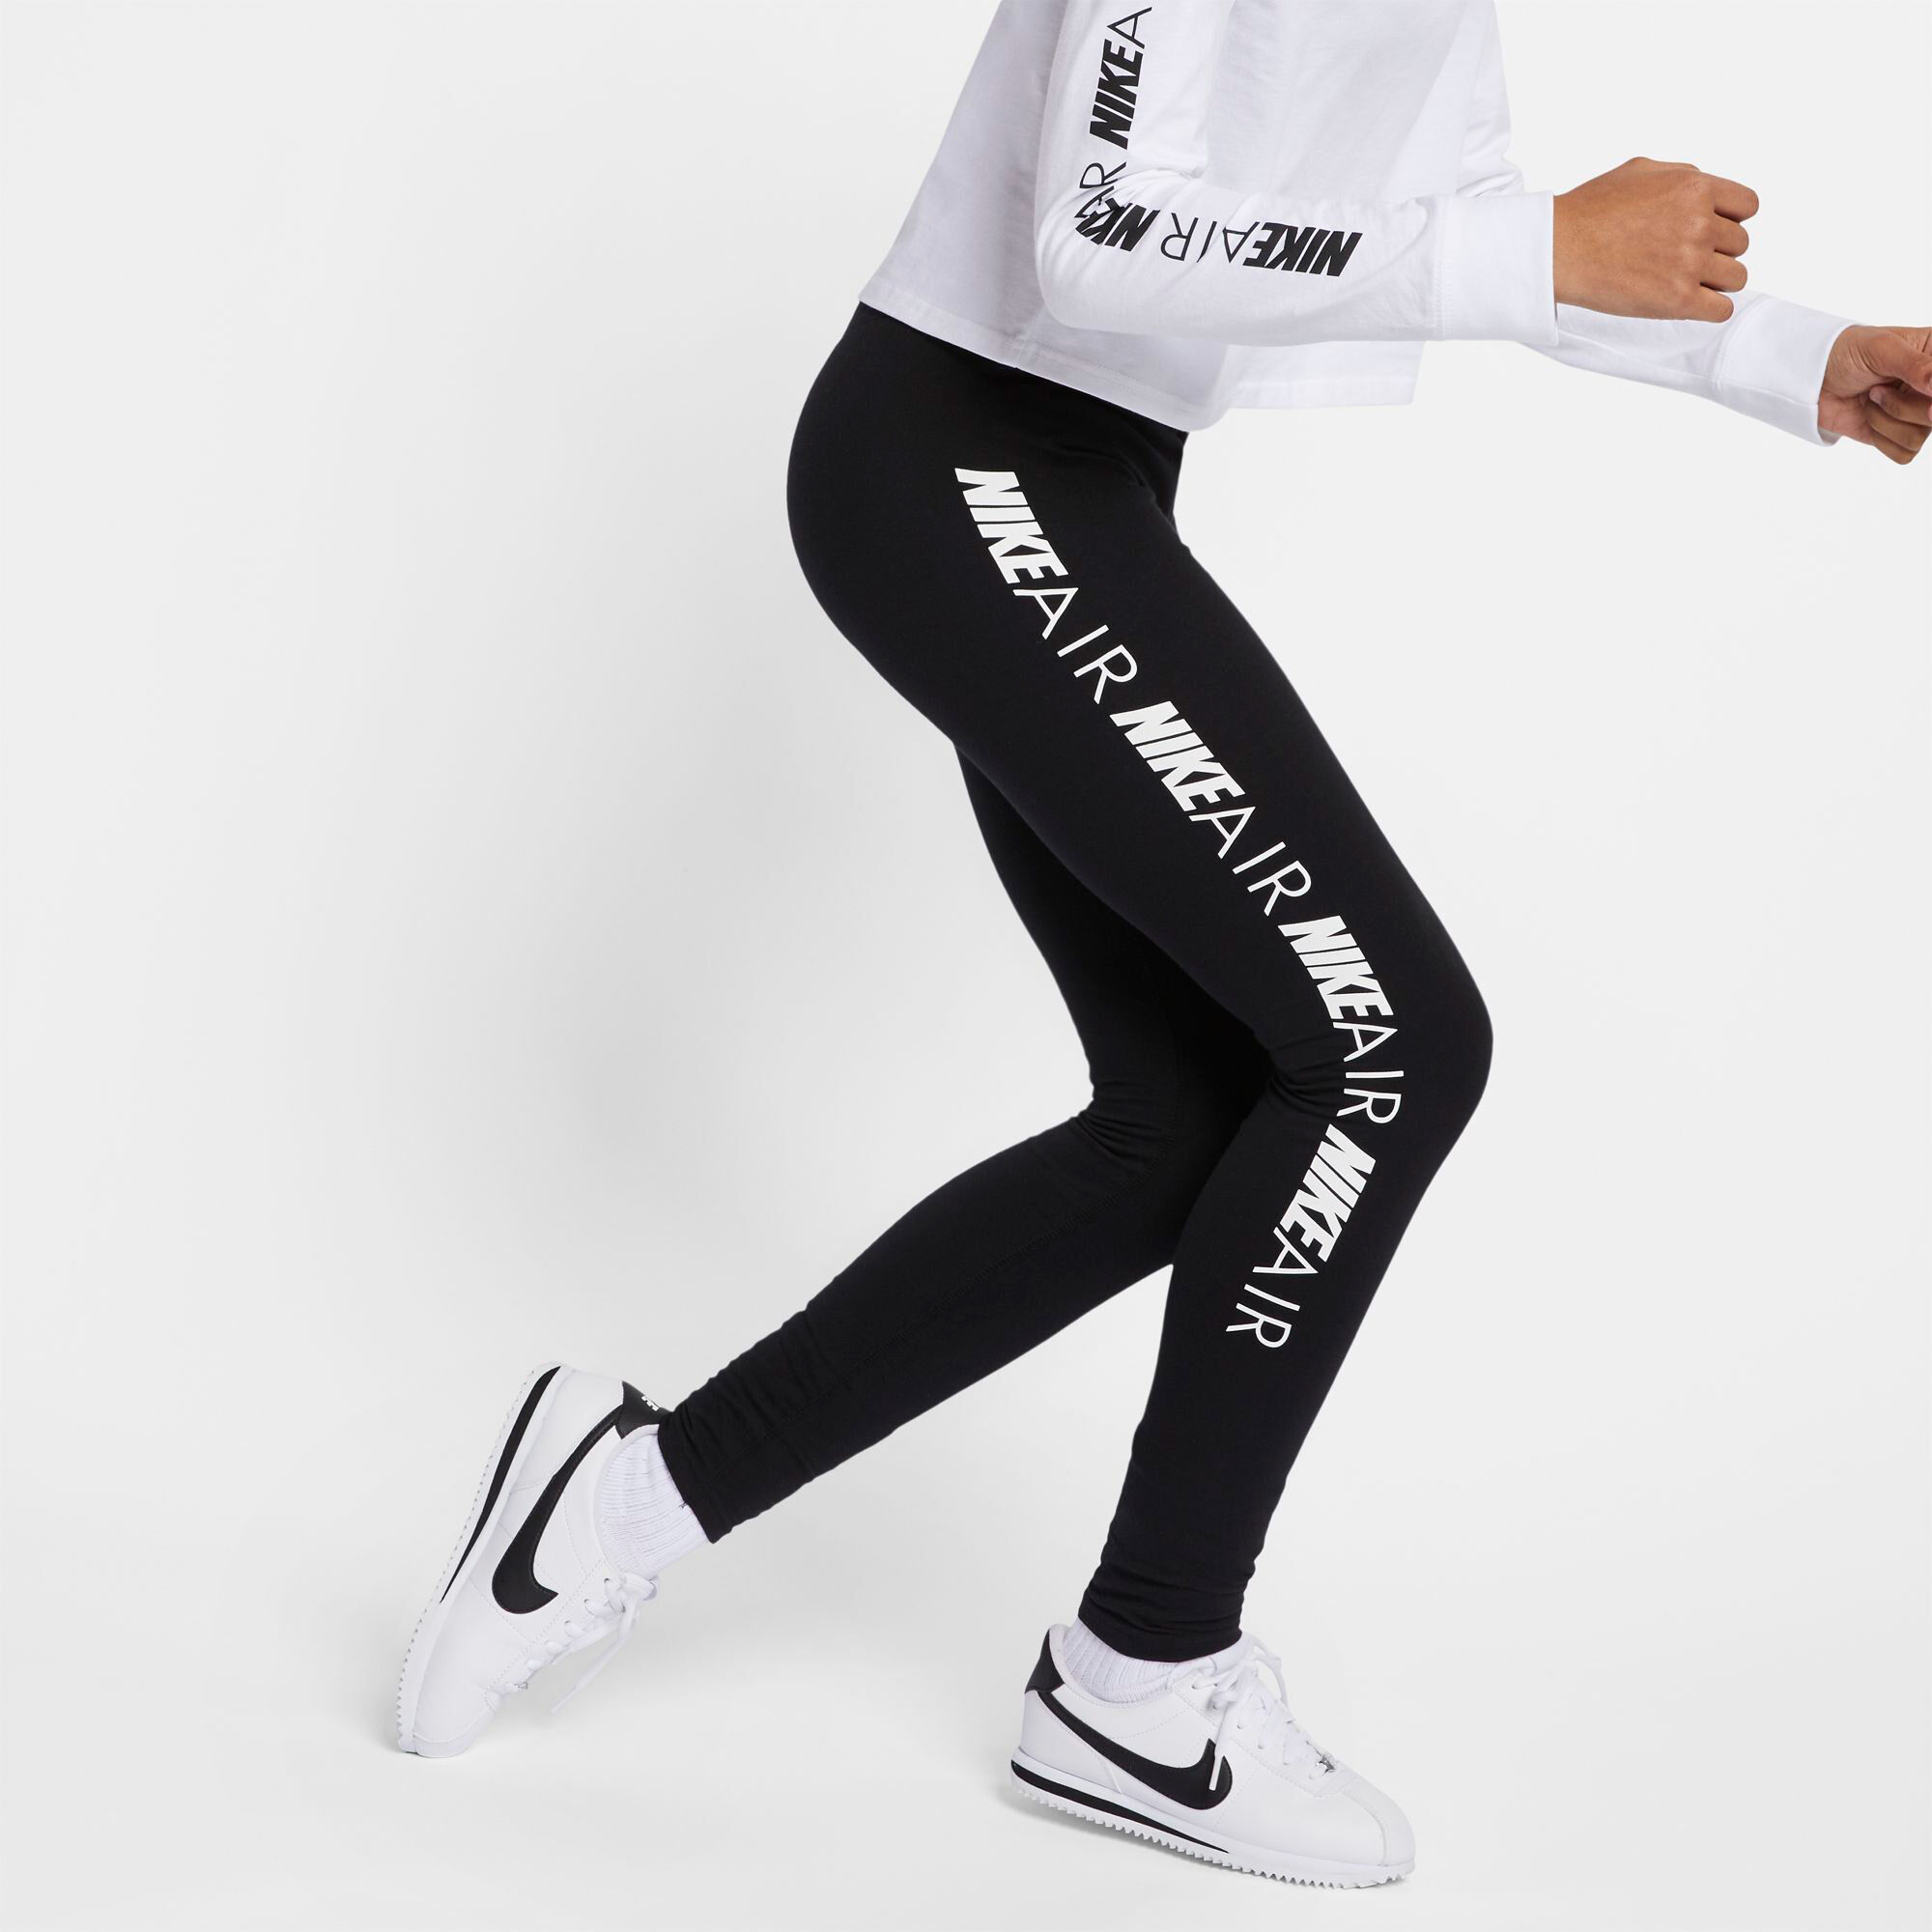 Nike Pantalones Nike Pantalones Intersport Nike Niño Niño Intersport Niño Bx6TPUwqw